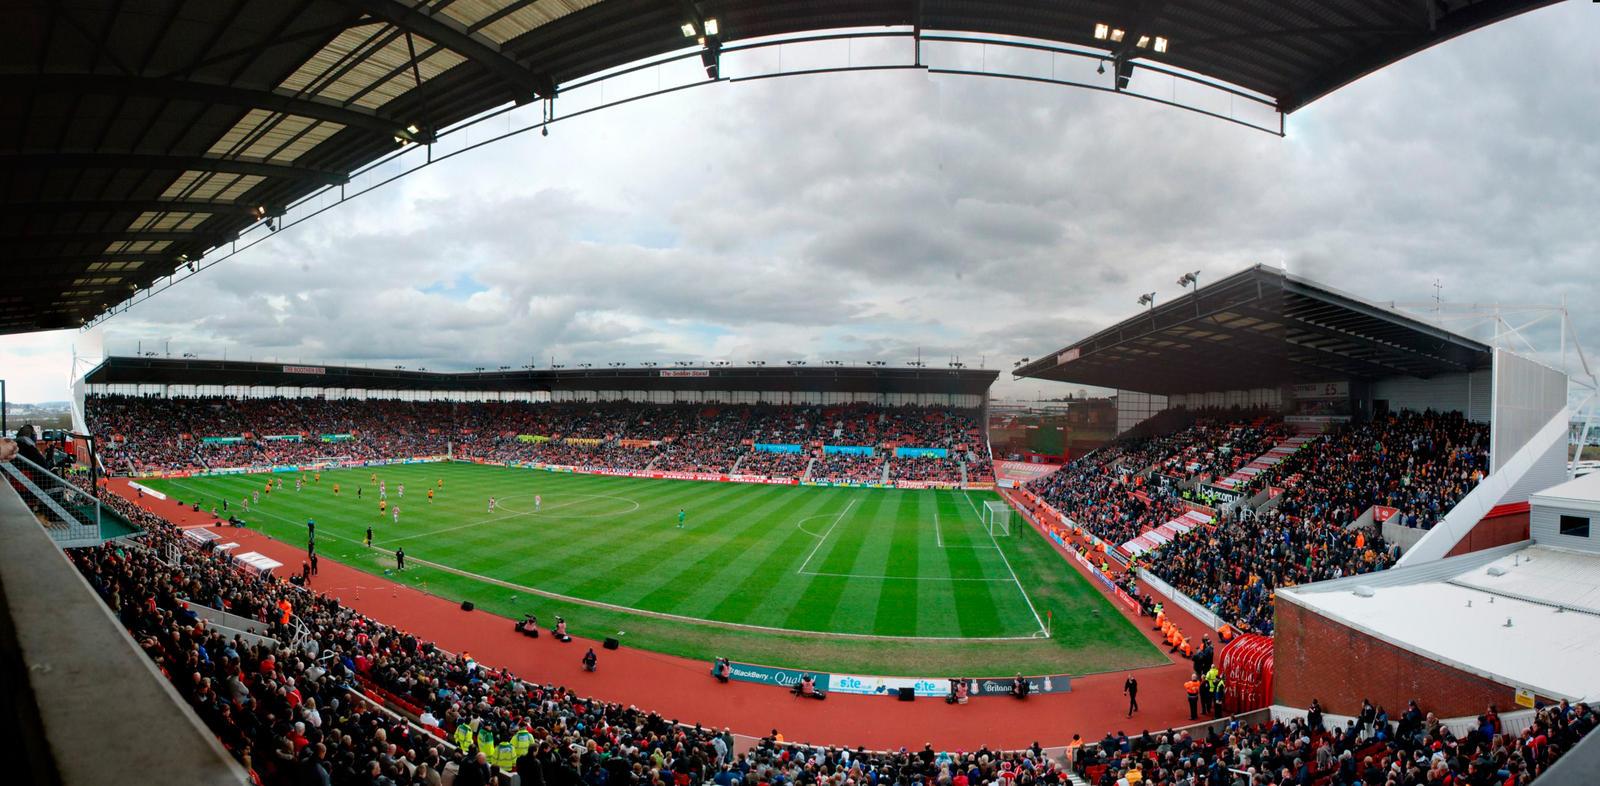 bet365 Stadium – StadiumDB.com